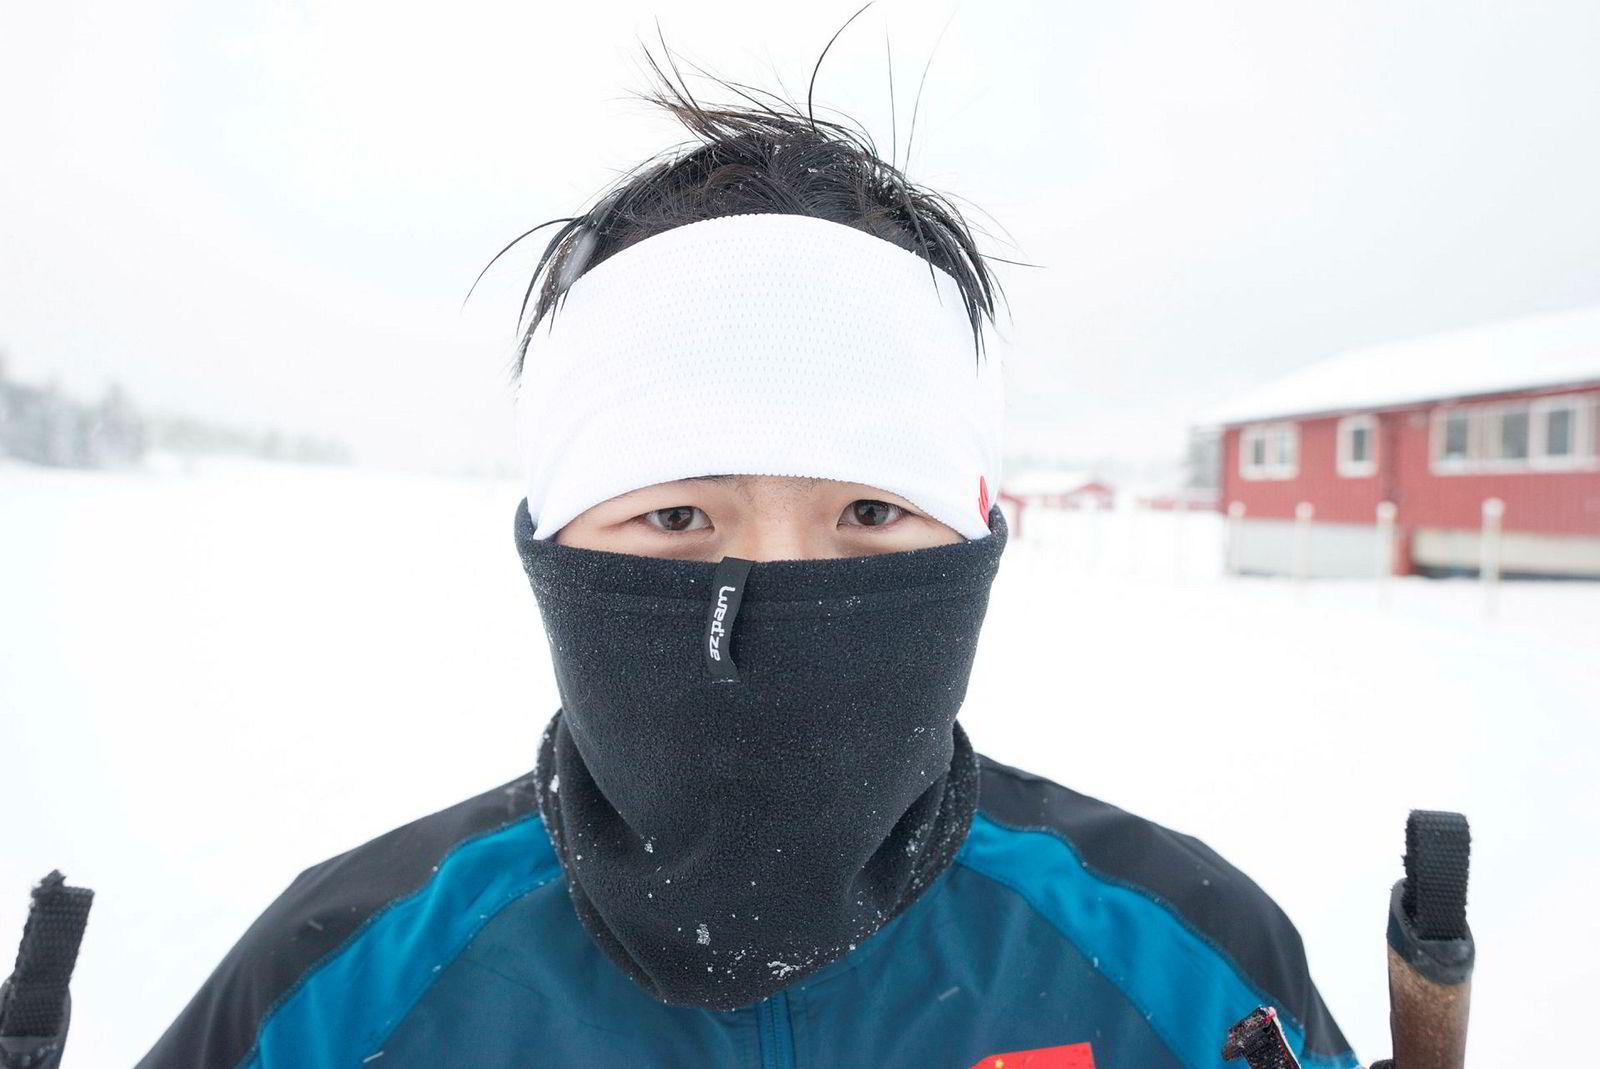 Wang Dingyao (20) holder kulden og snøføyken unna.